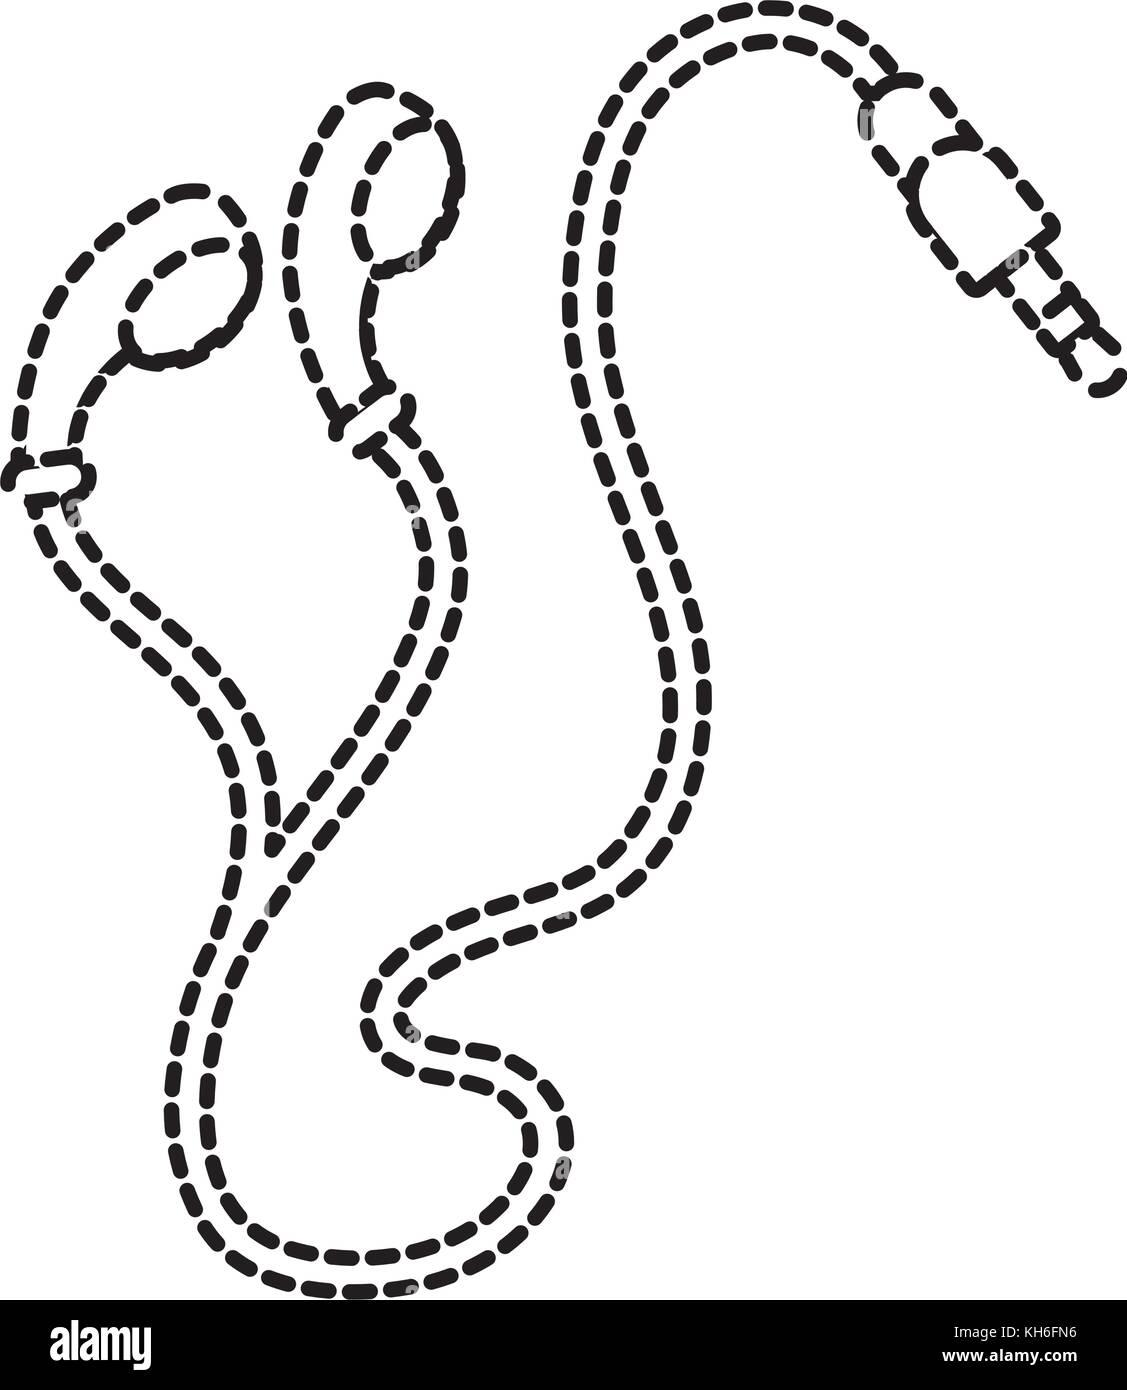 c7 plug wiring diagram database Stereo Jack Wiring earphones plug multimedia music cable stock vector art c14 plug c7 plug